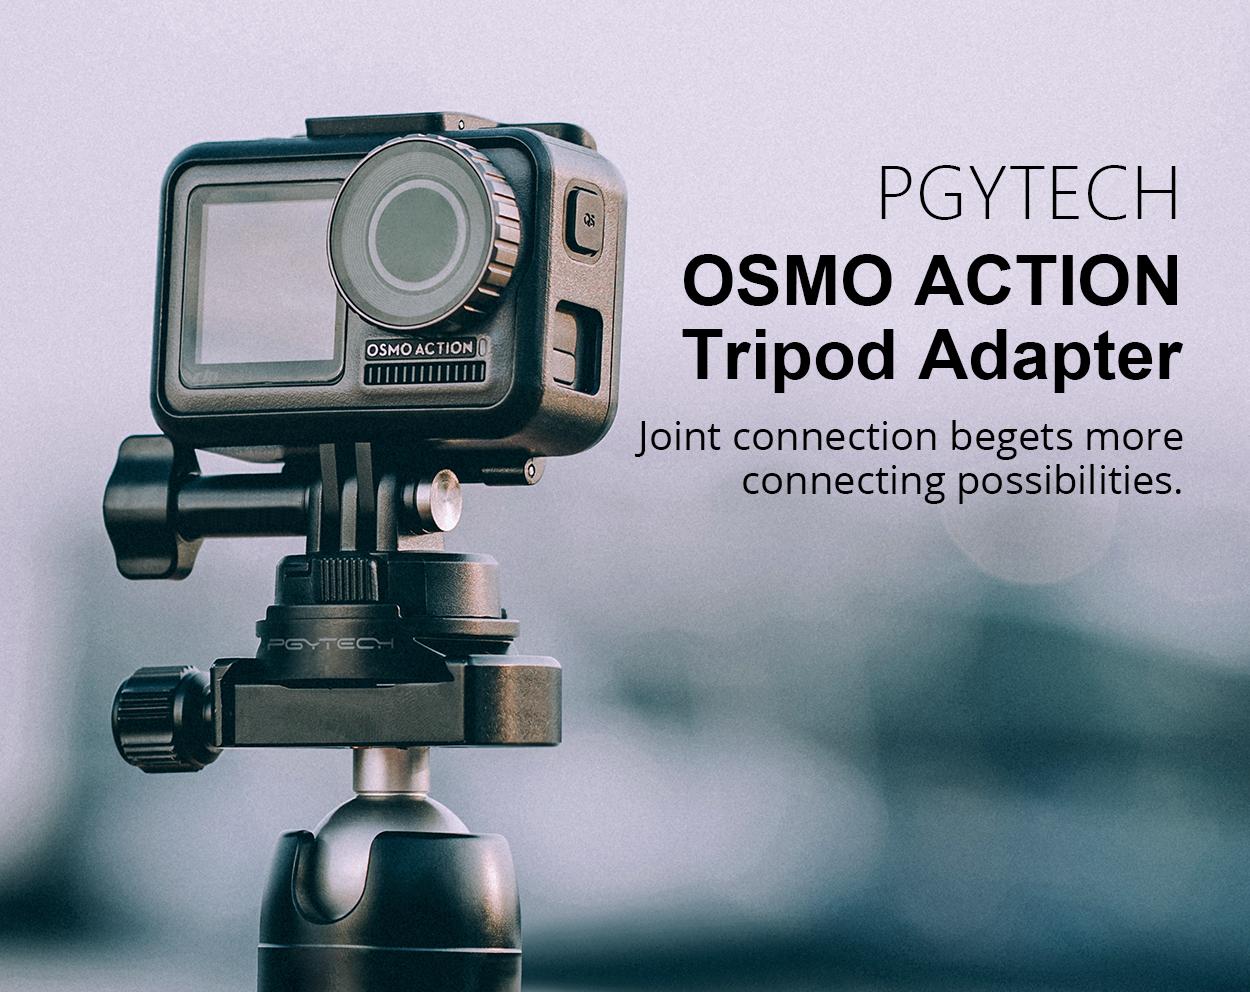 1tripod-adapter.jpg